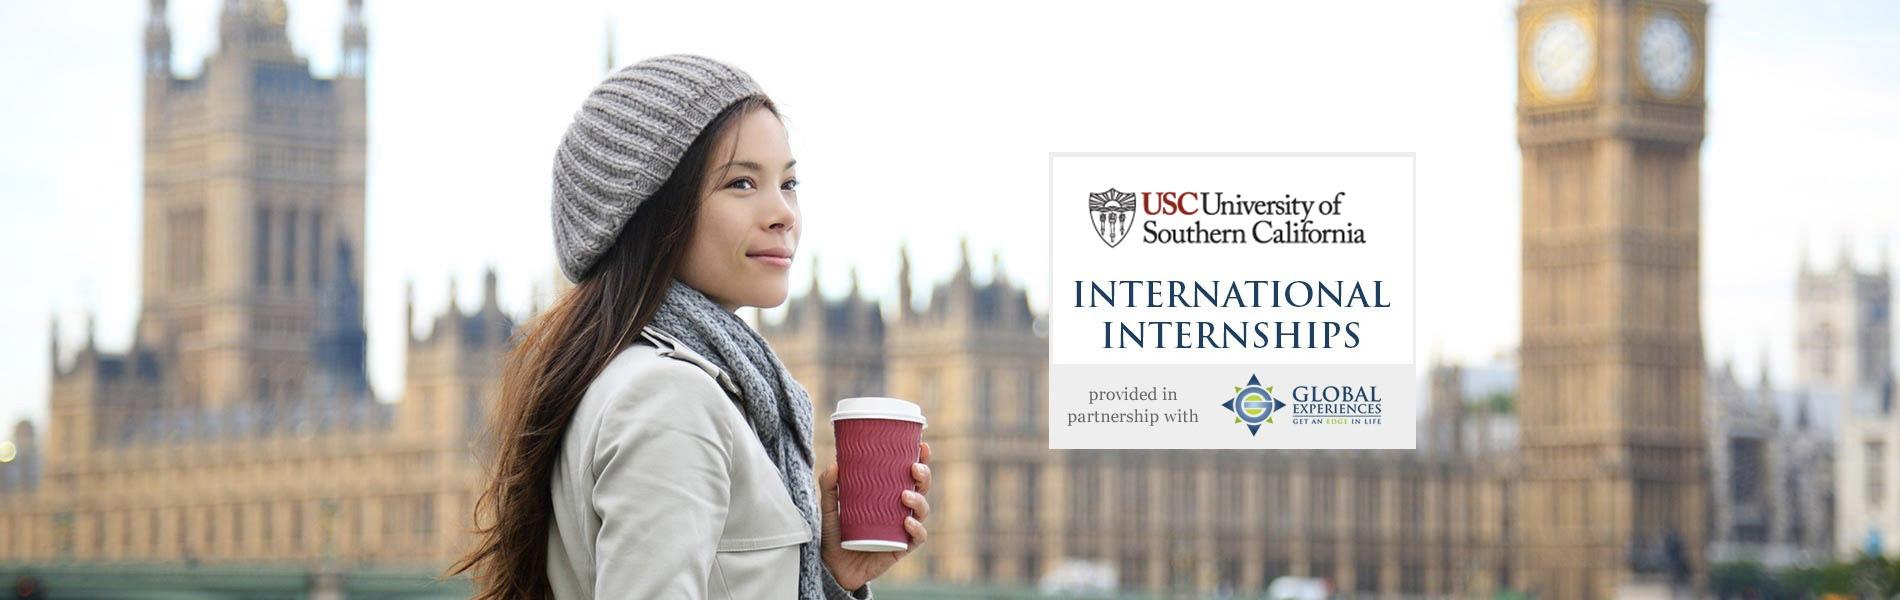 university of southern California intern abroad